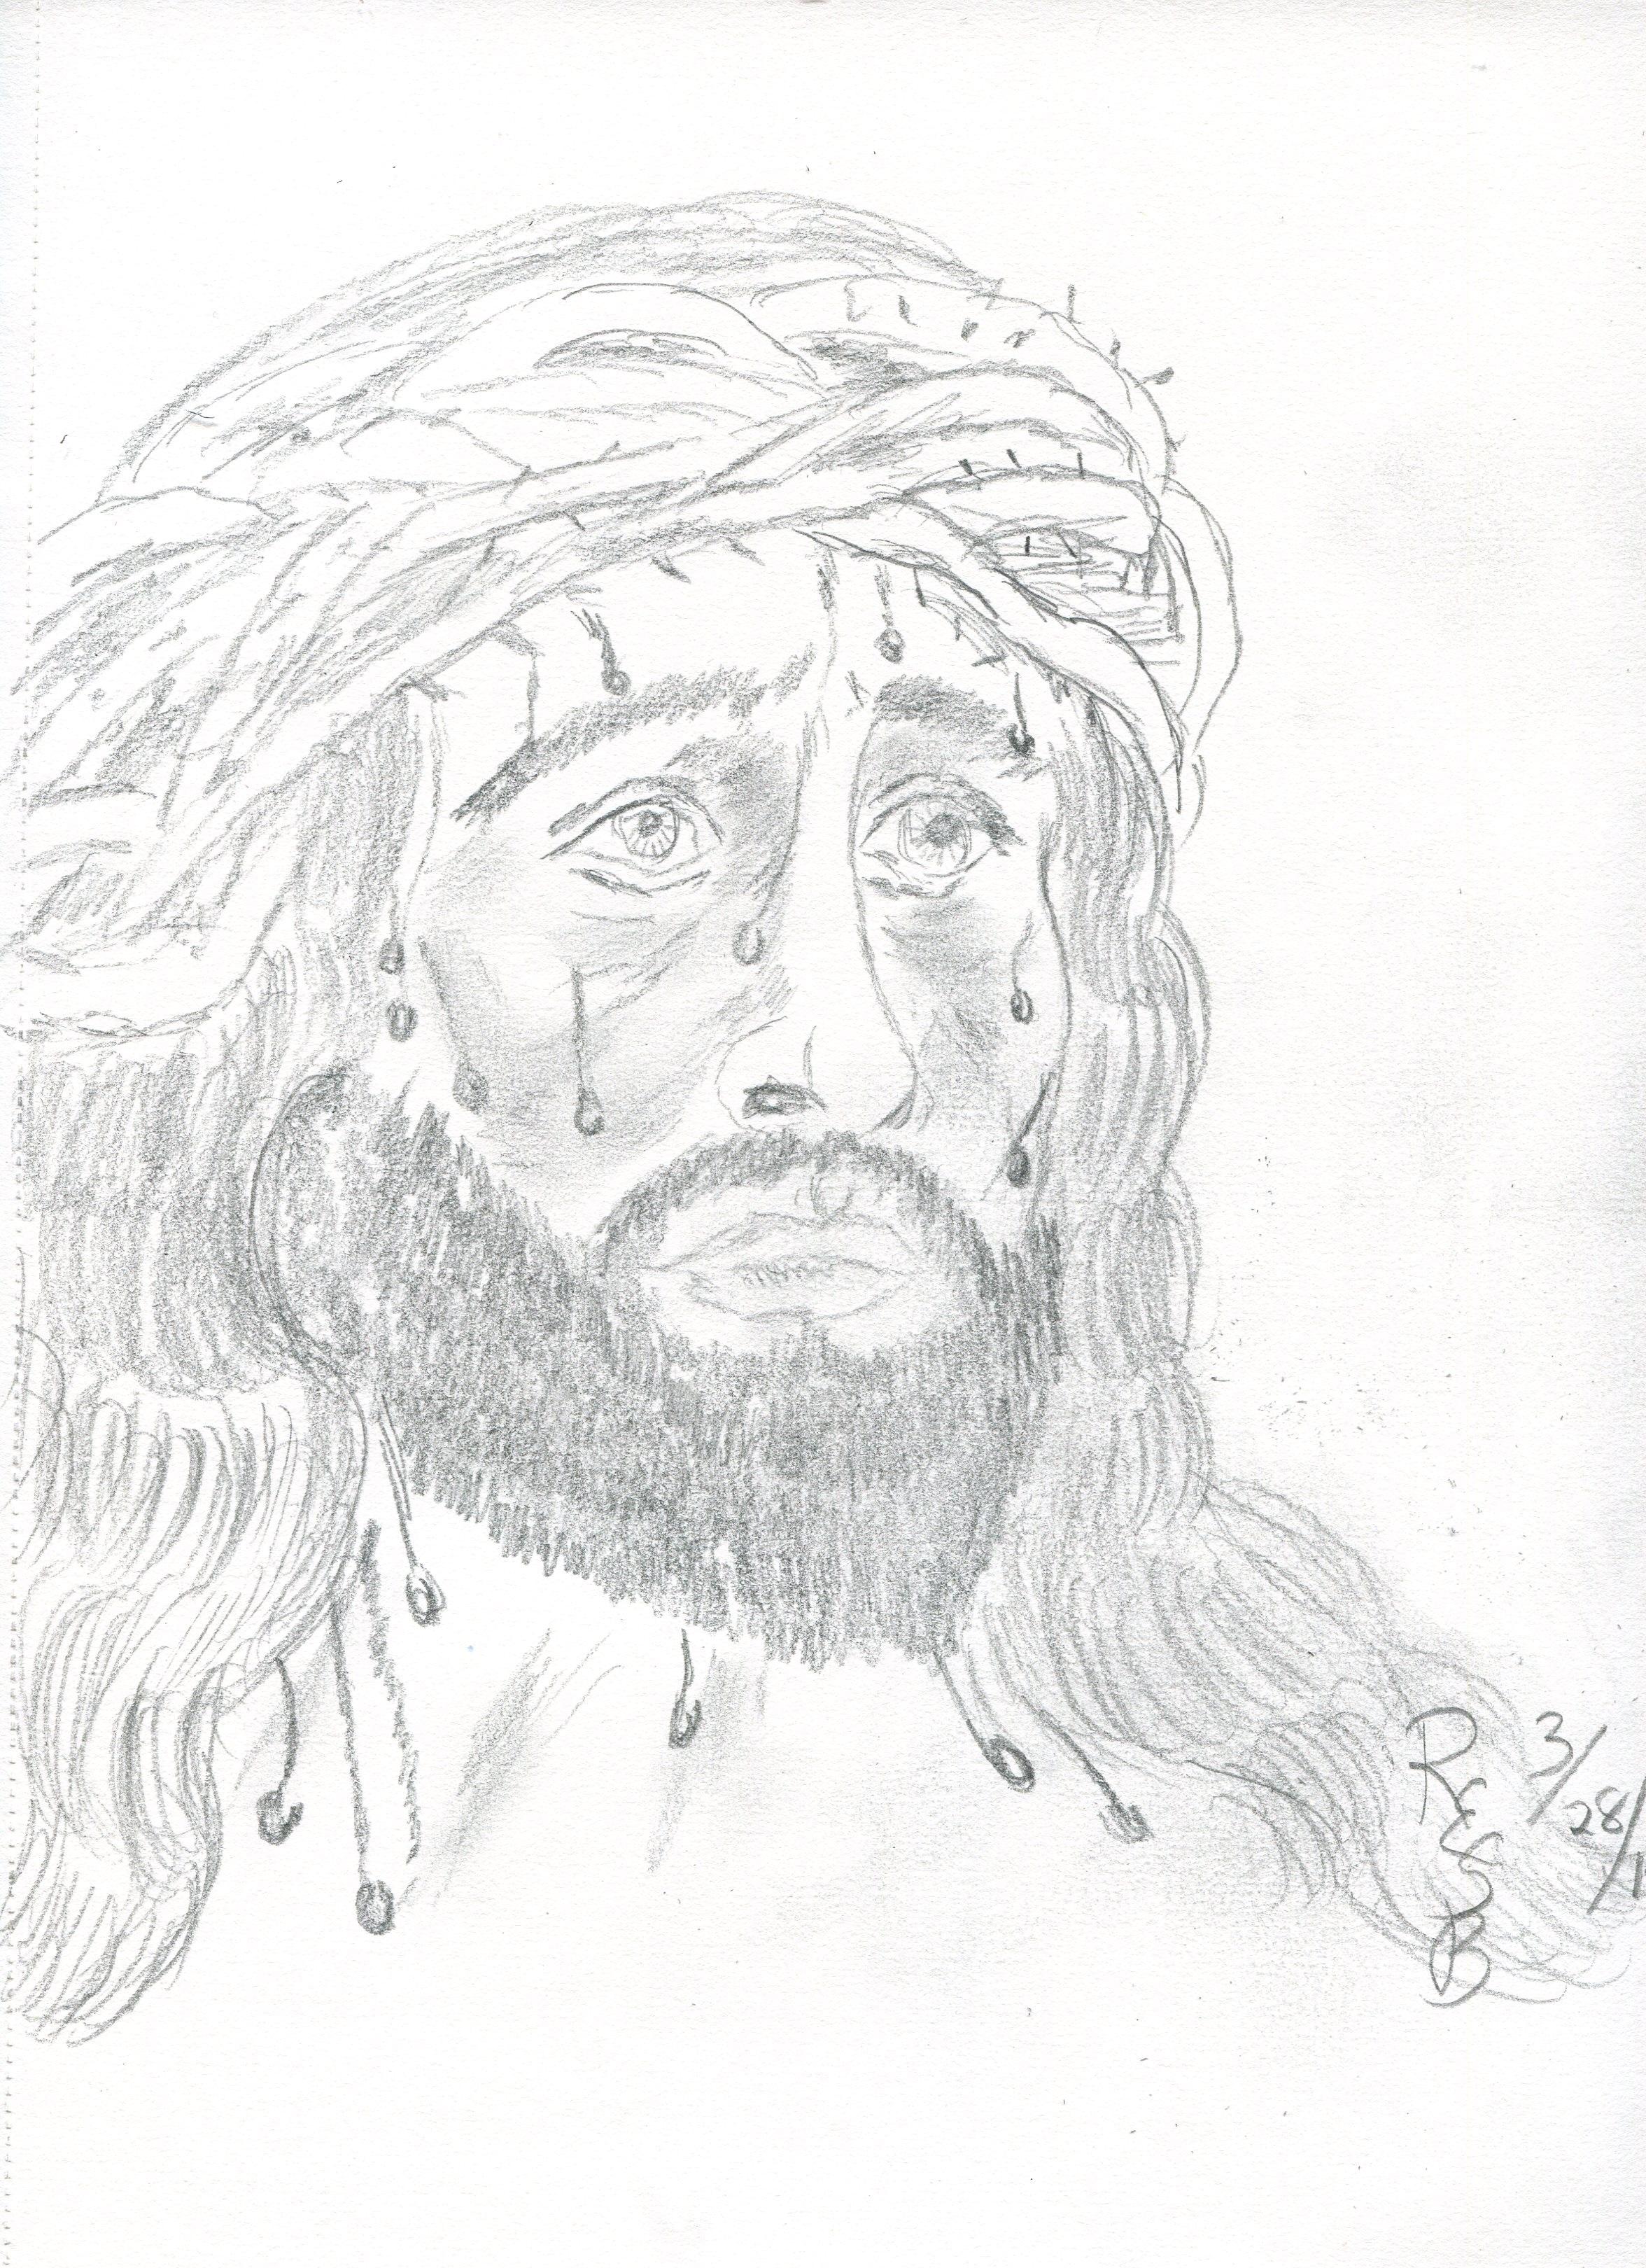 2352x3240 A Pencil Sketch March 28, 215 By Rhdda Ellen Stevens Bounds